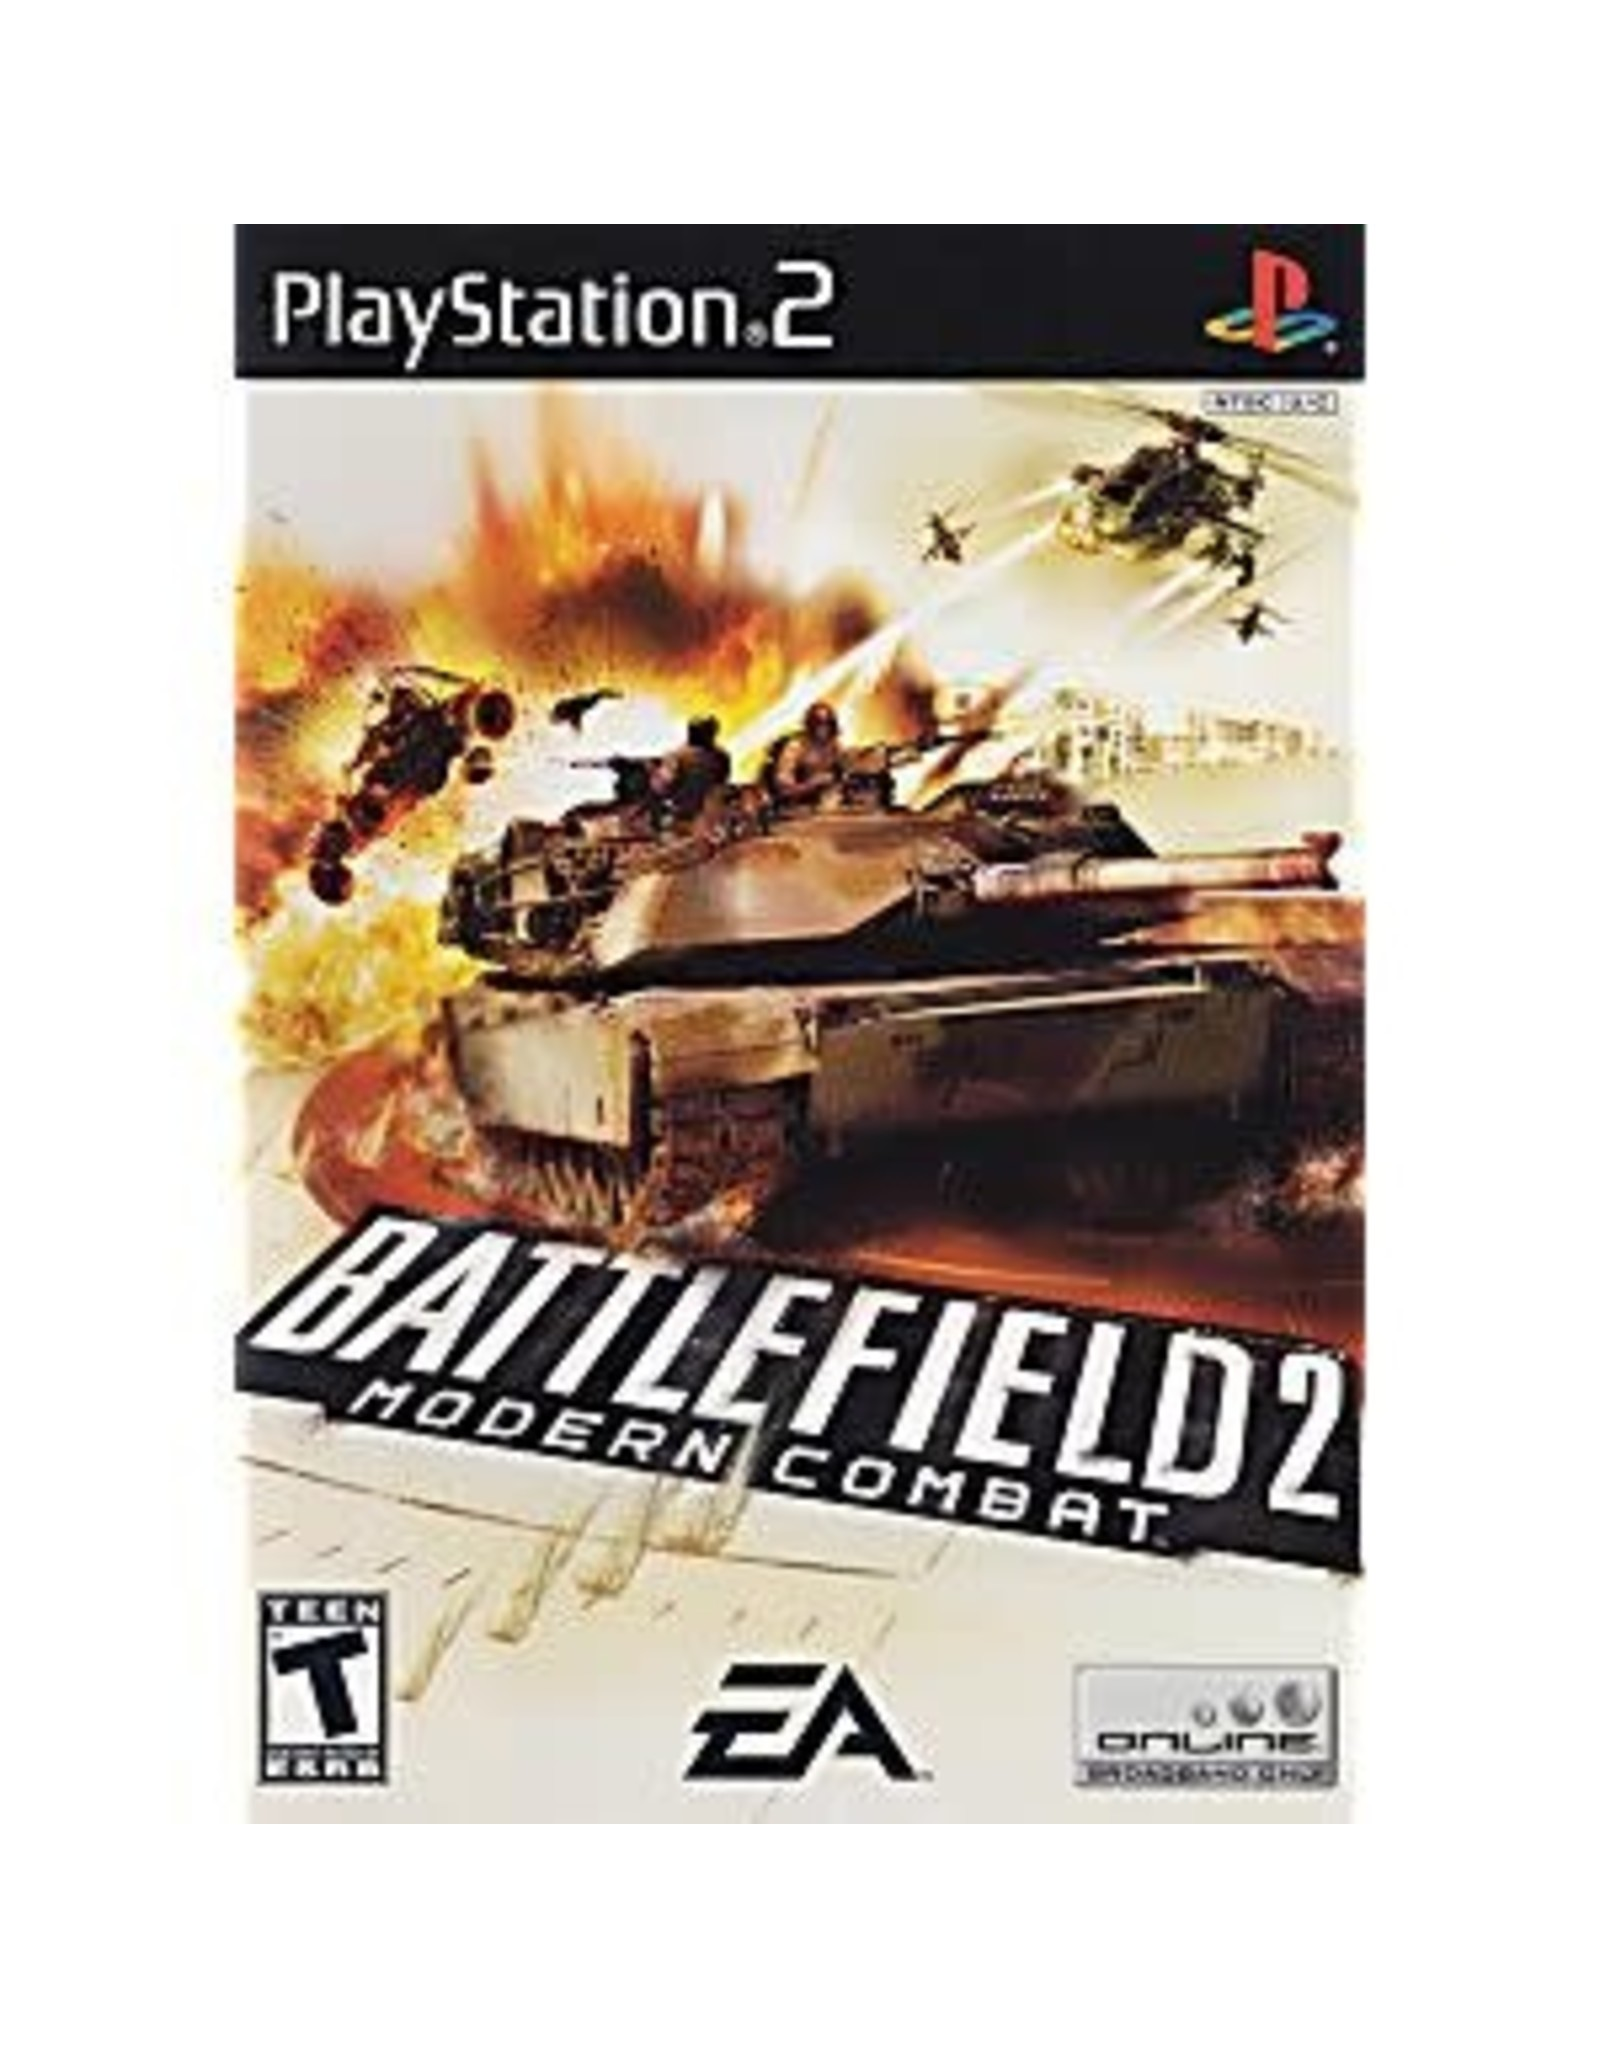 Playstation 2 Battlefield 2 Modern Combat (No Manual)